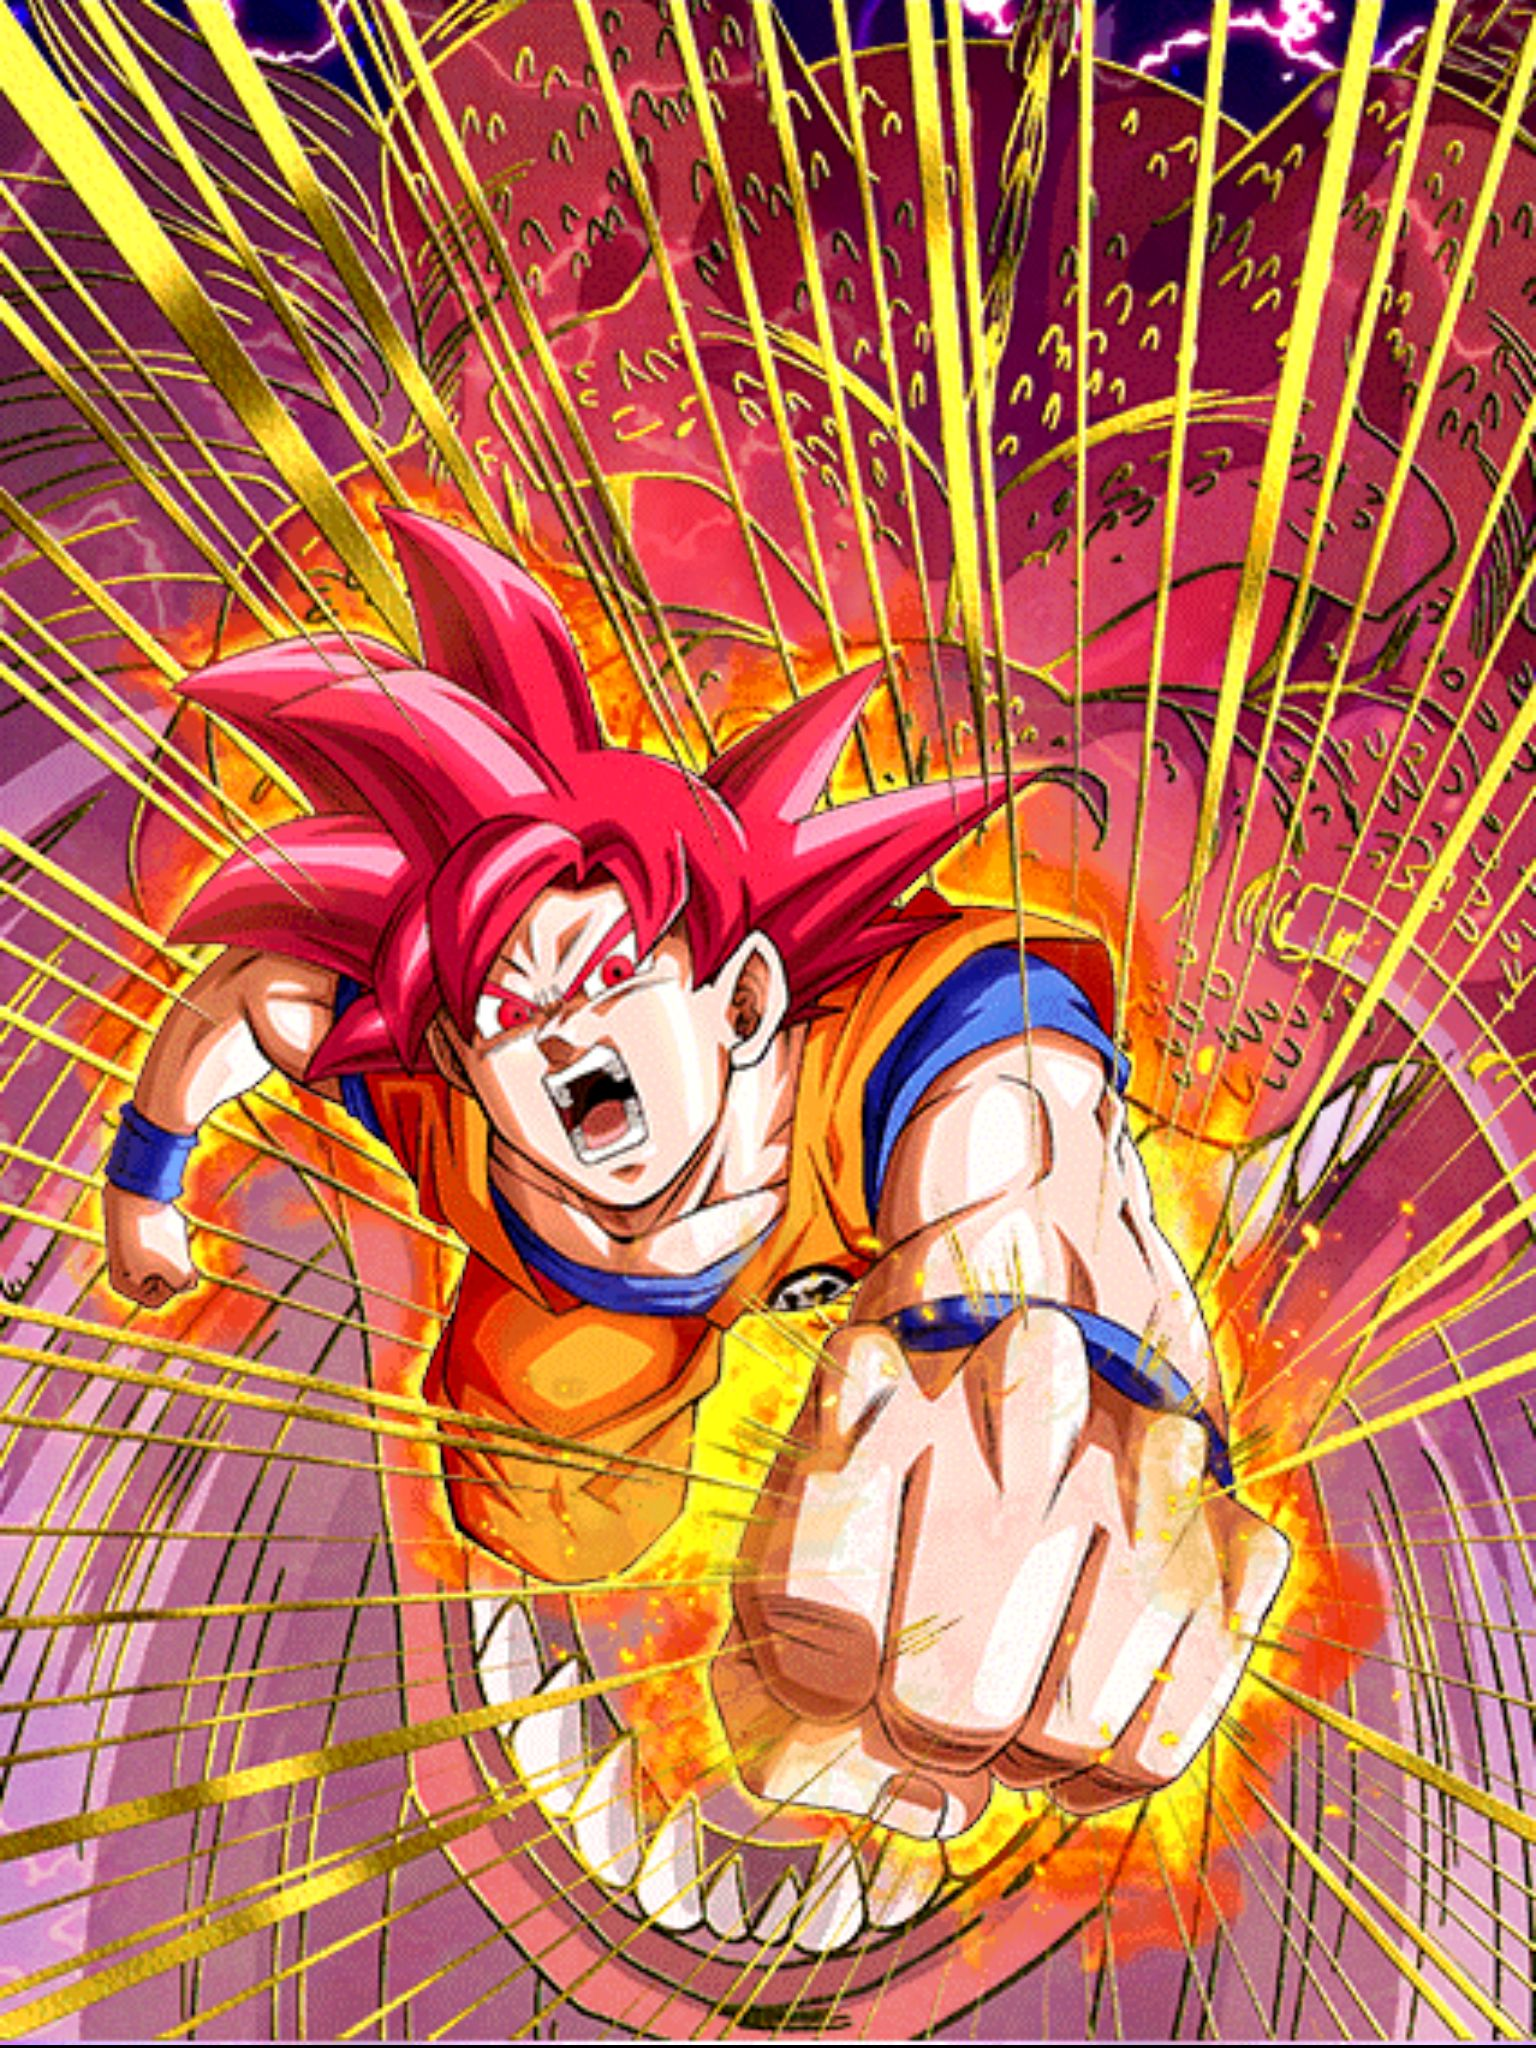 Dragon Ball Z Dokkan Battle 孫悟空 超サイヤ人ゴッド Anime Dragon Ball Super Anime Dragon Ball Dragon Ball Artwork